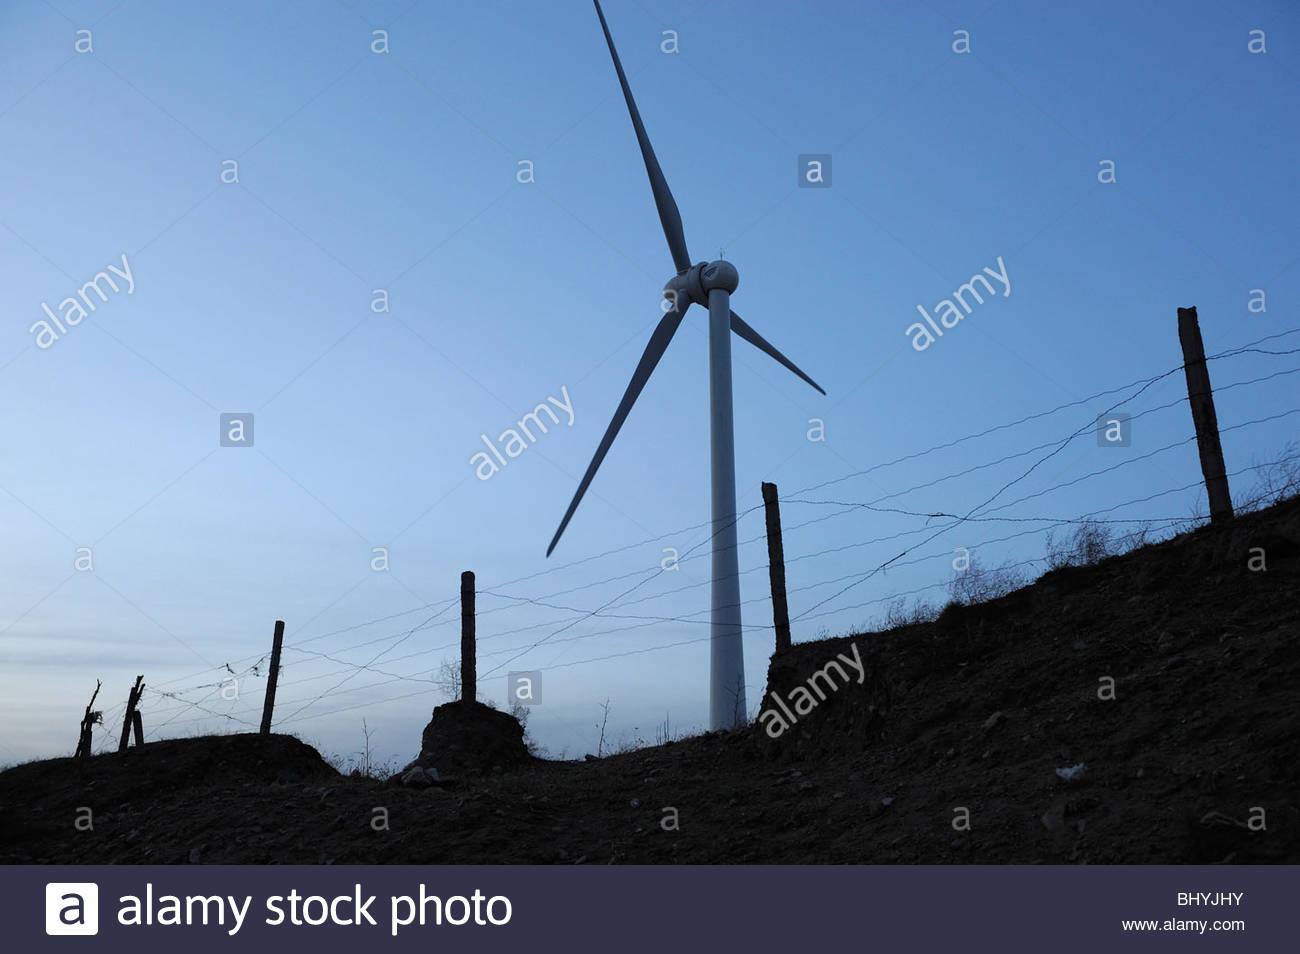 Wind Farm Turbine. - Stock Image